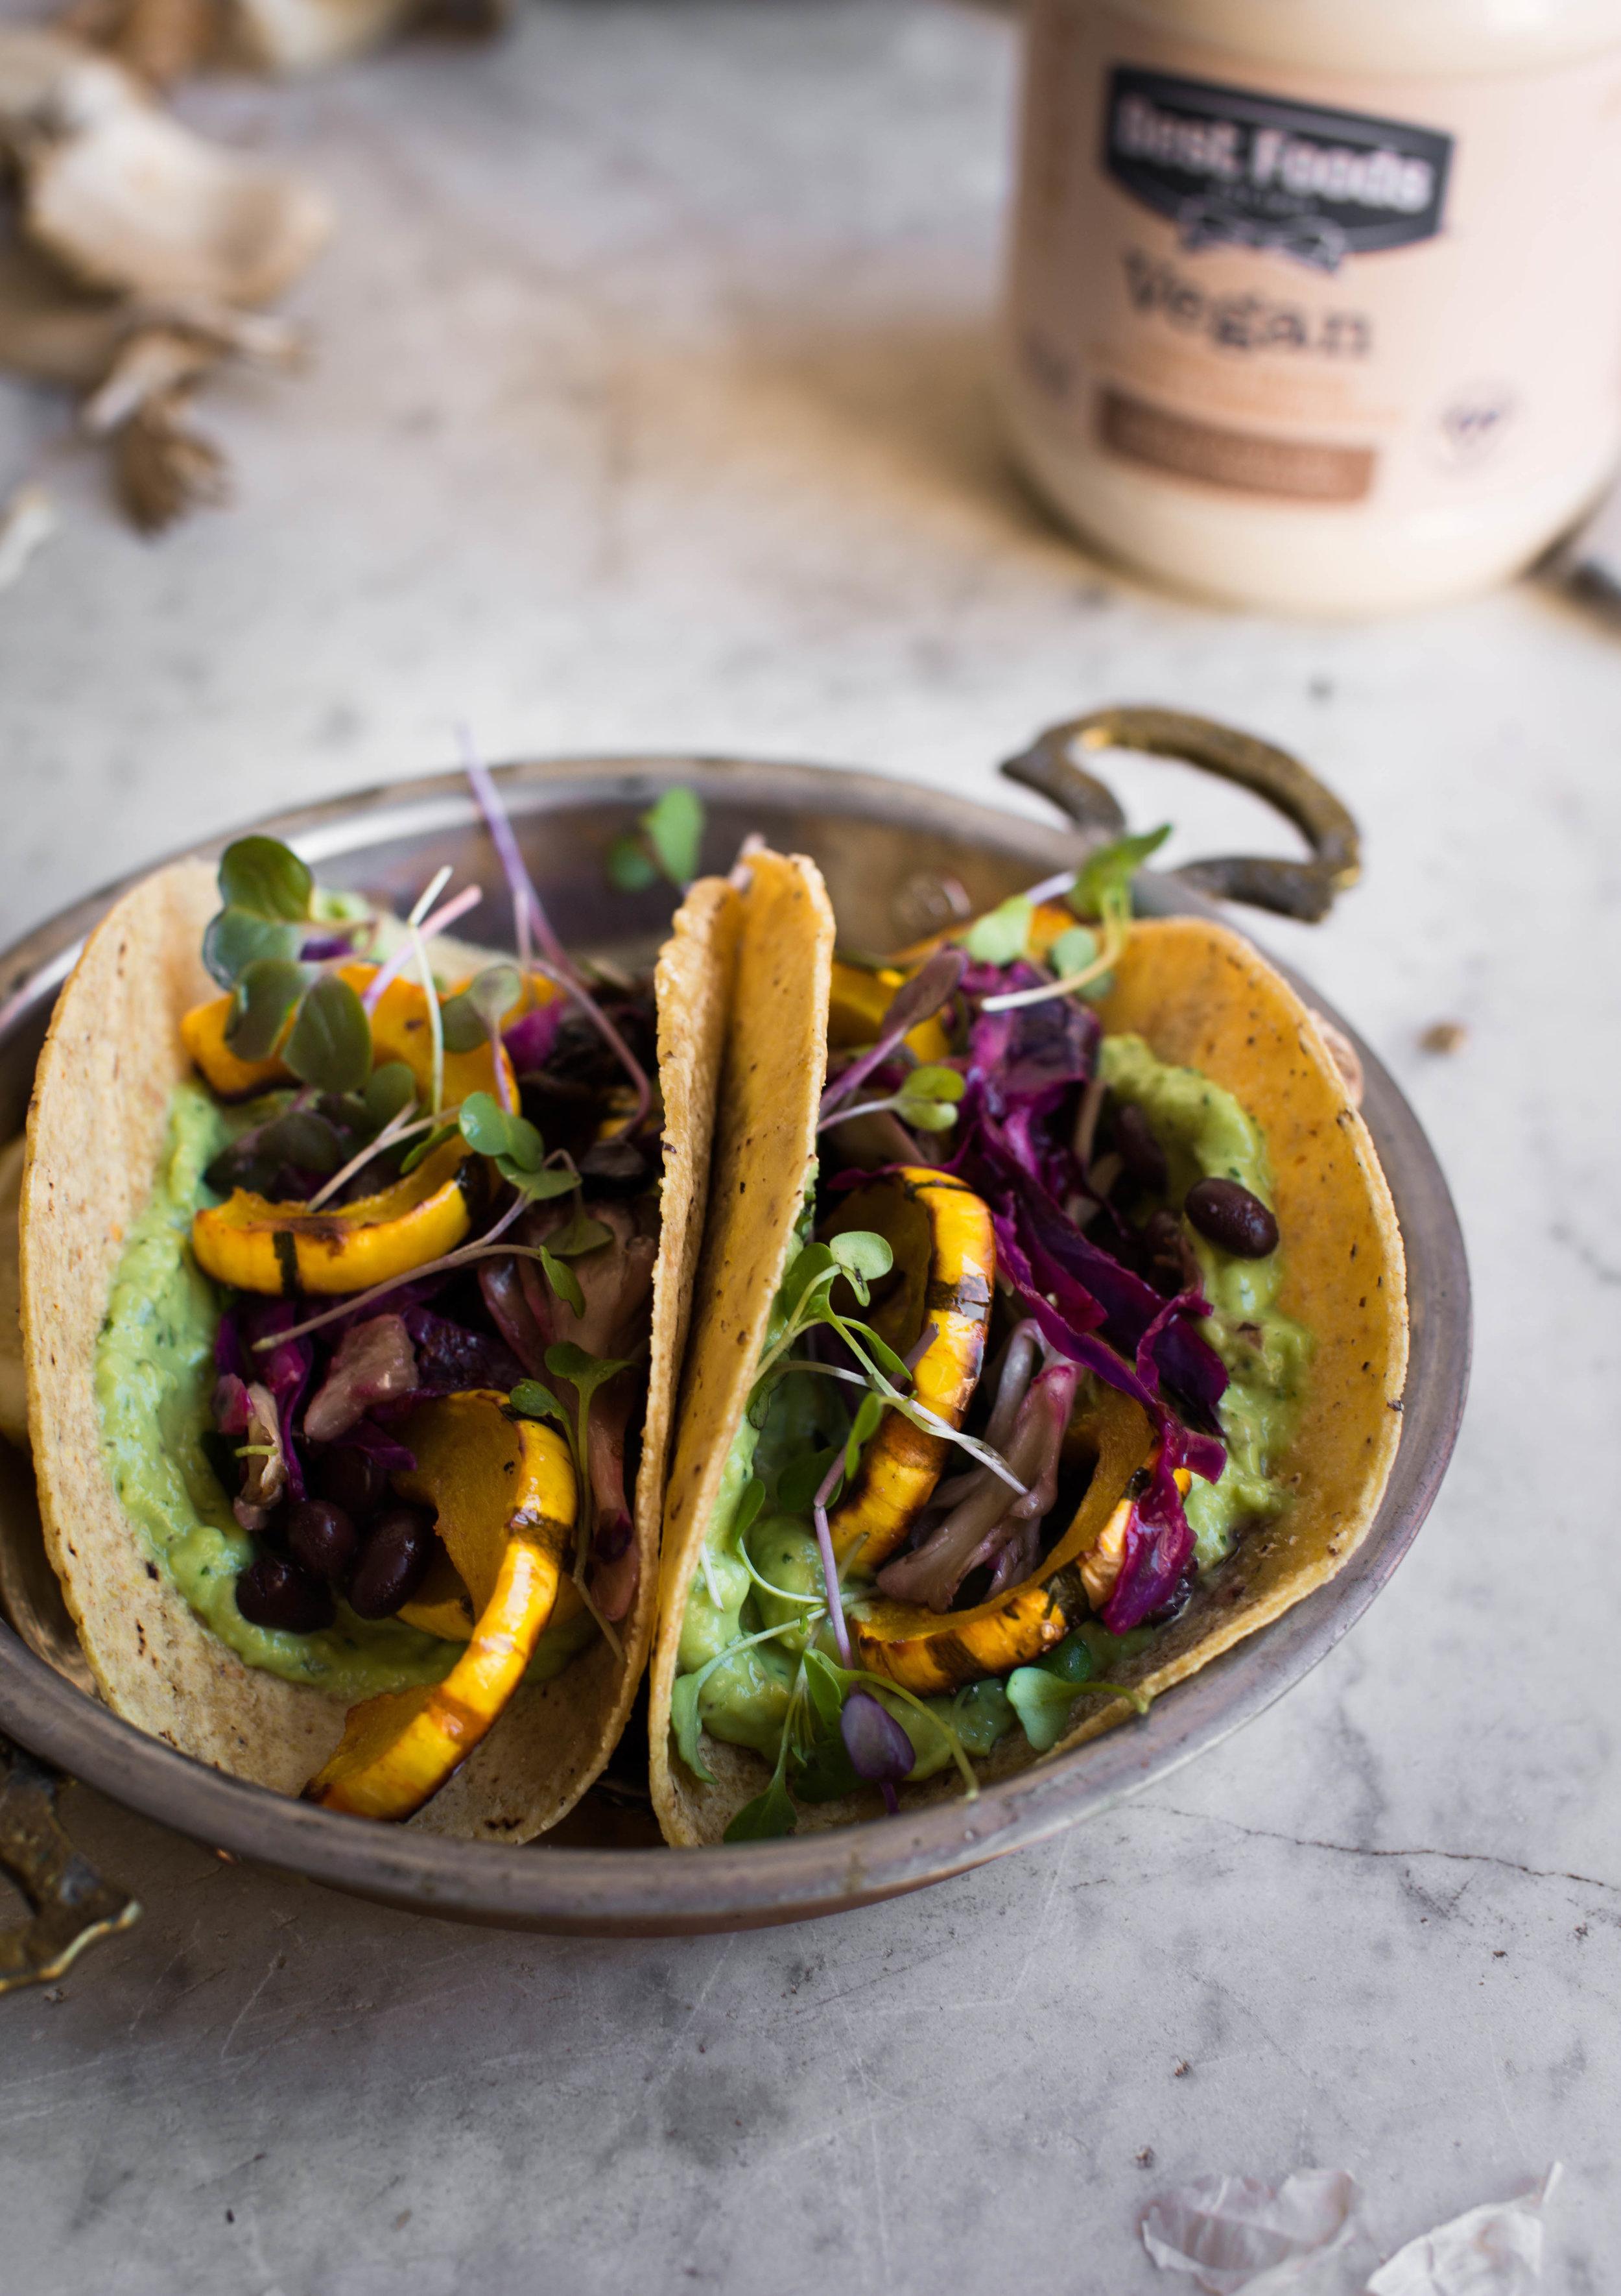 Fall-Breakfast-Tacos-with-Avocado-Cream-and-Squash | www.8thandlake.com